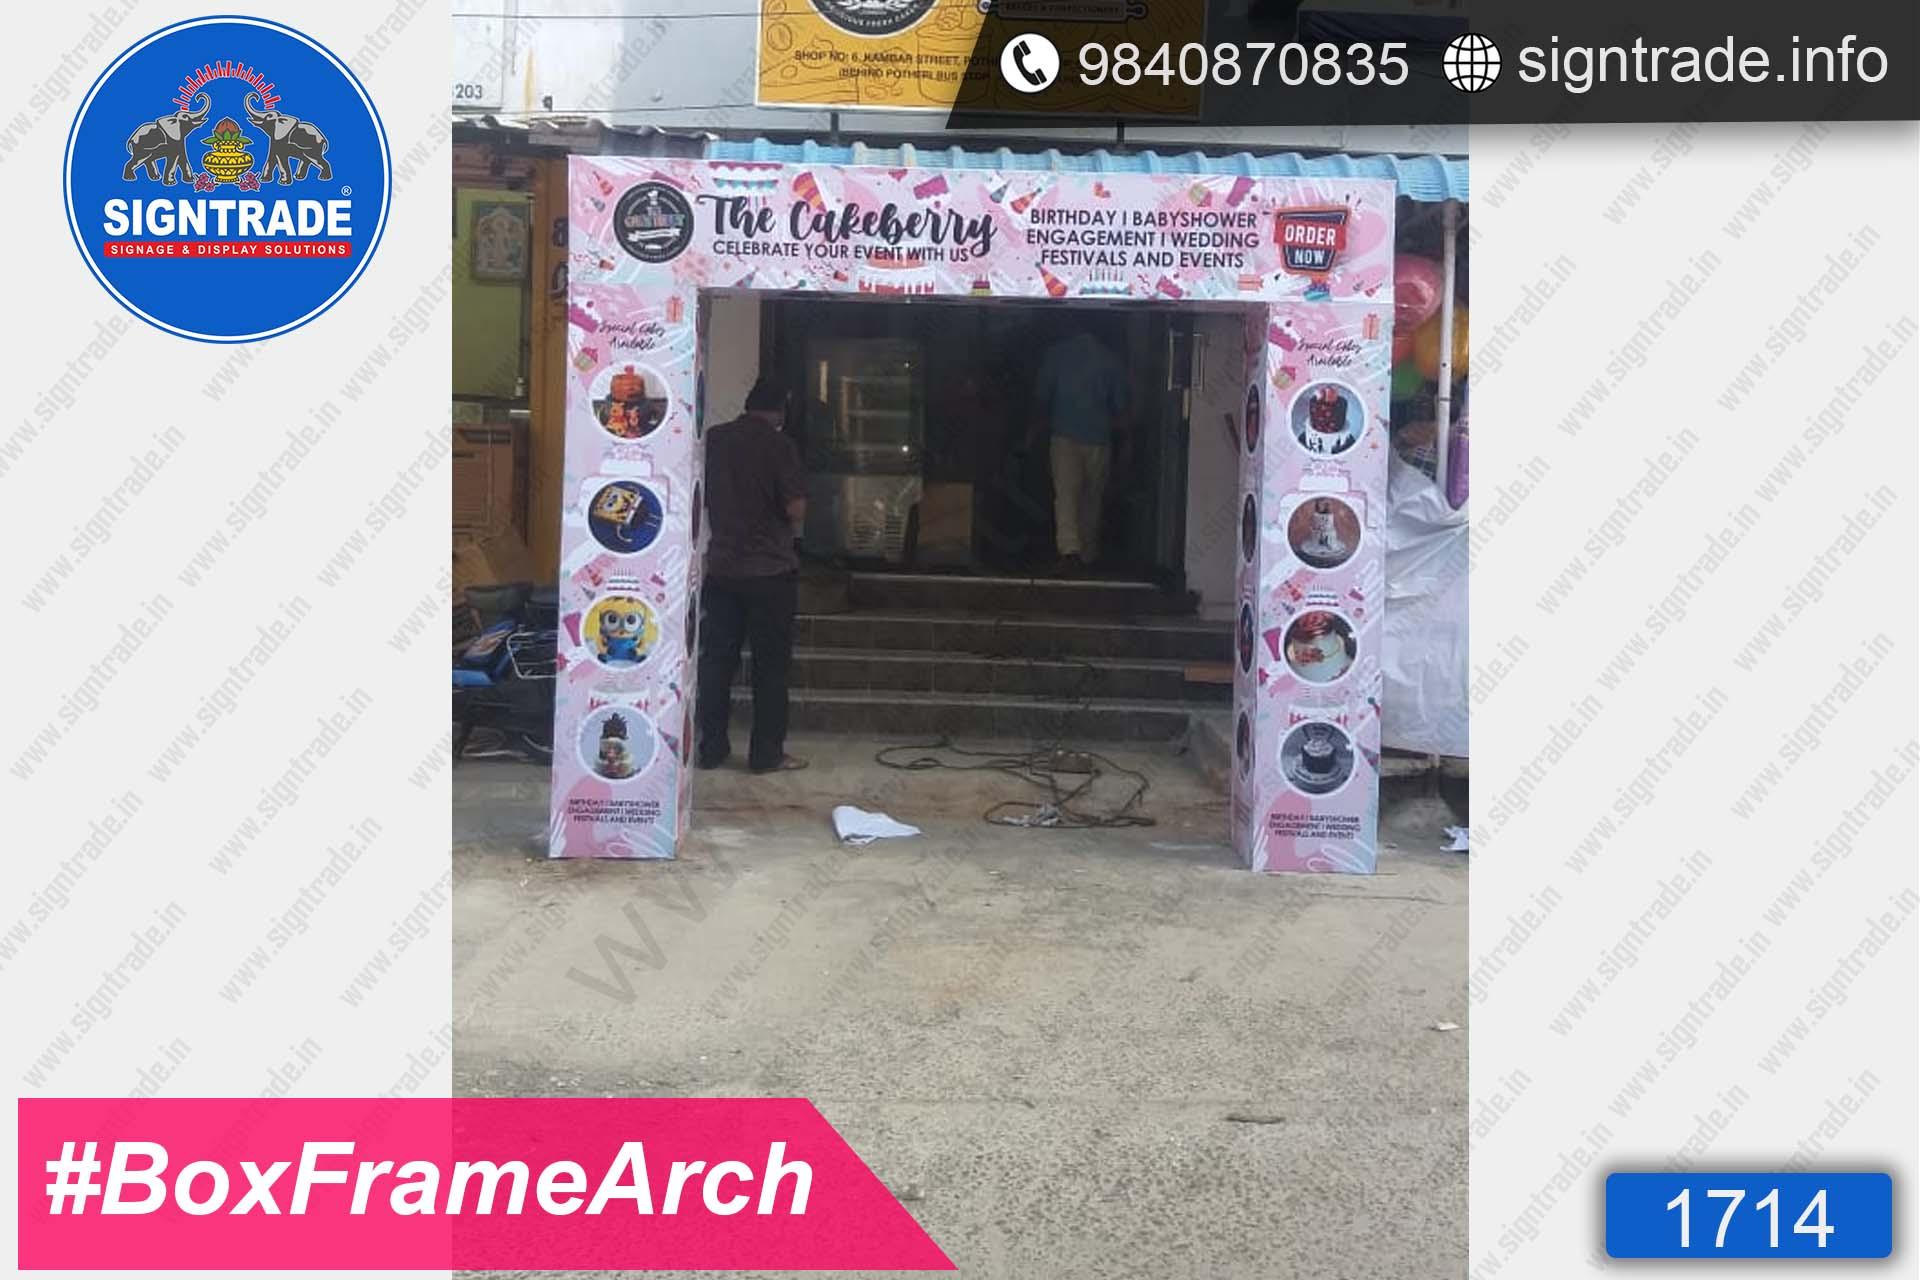 Box Frame Arch, Chennai - SIGNTRADE - Box Frame Entrance Arch Manufacturers in Chennai